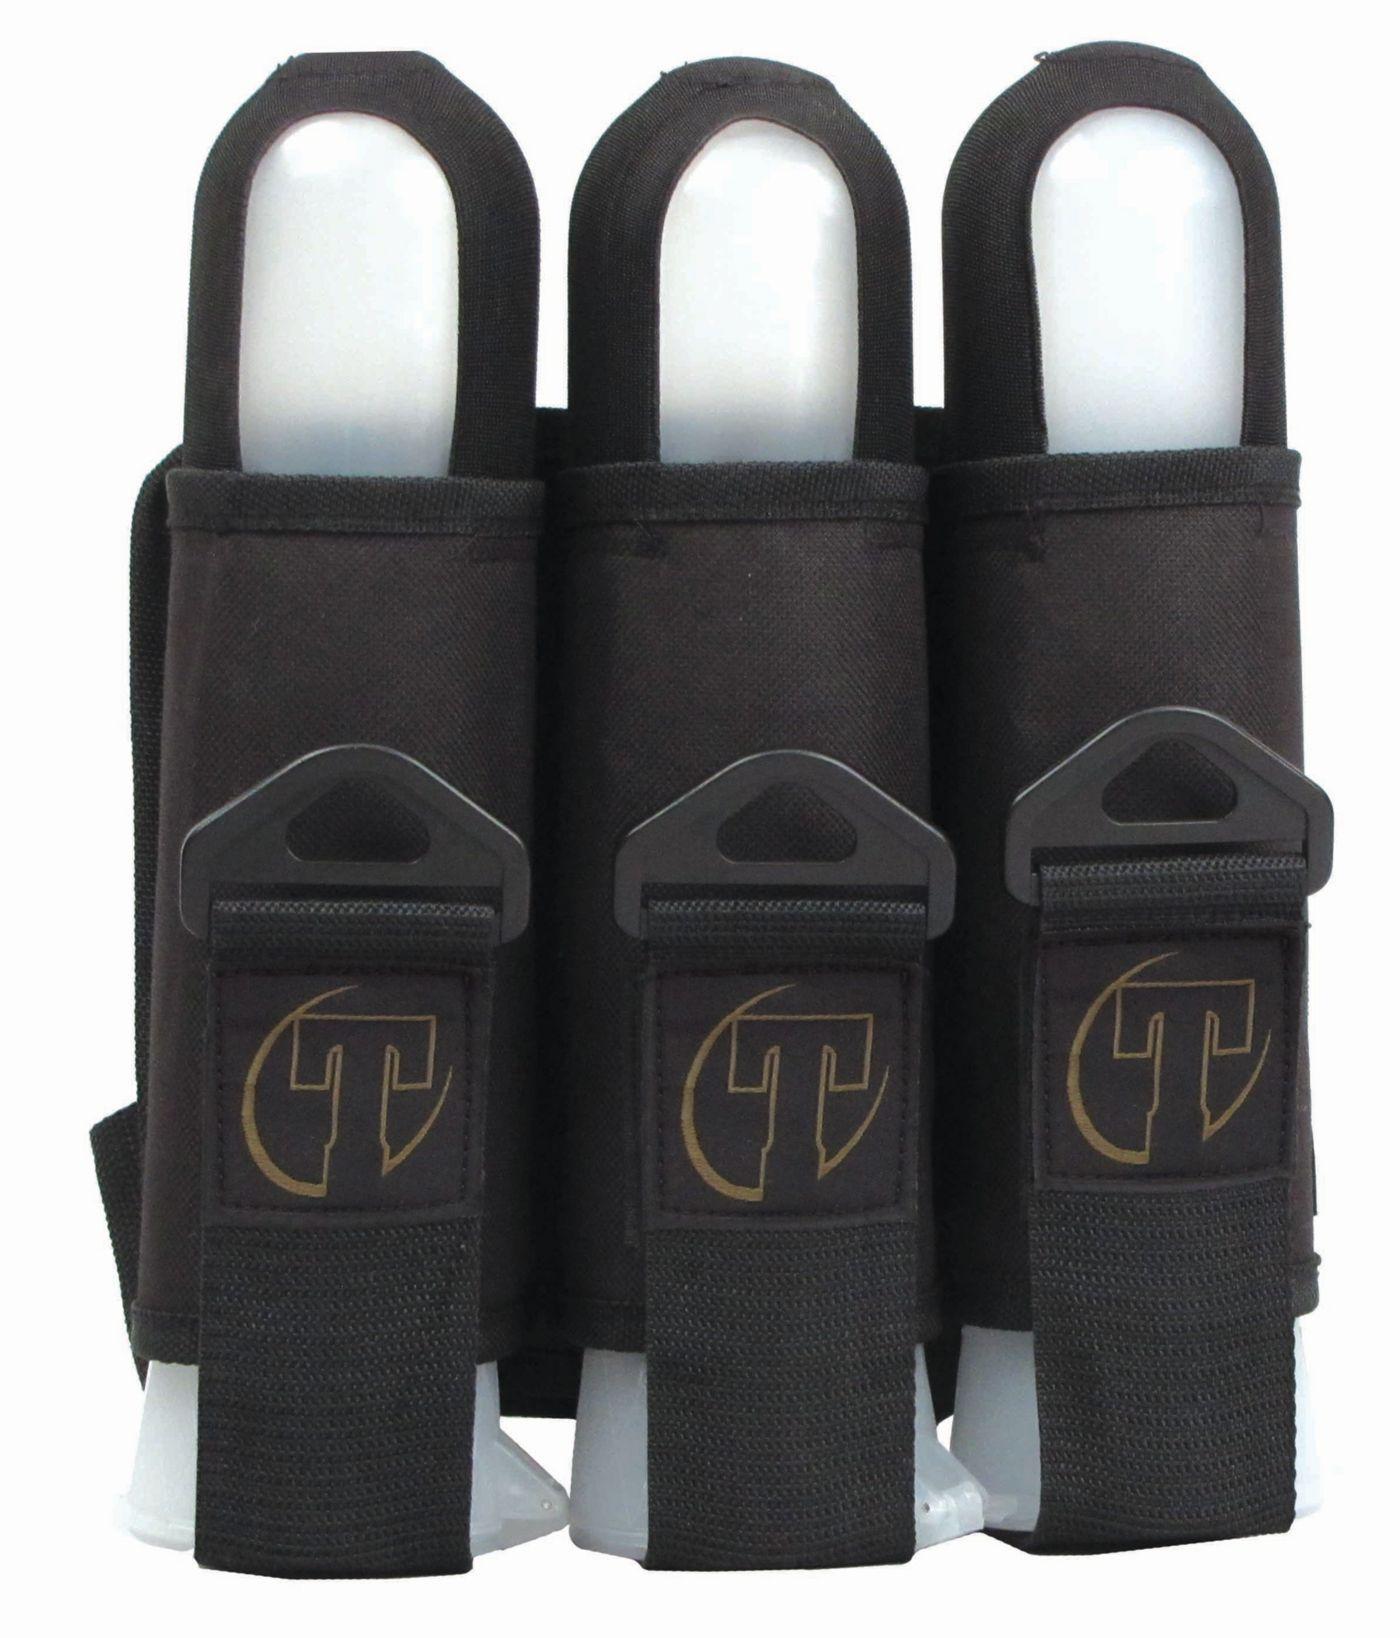 Tippmann 3 Pod Sport Series Harness